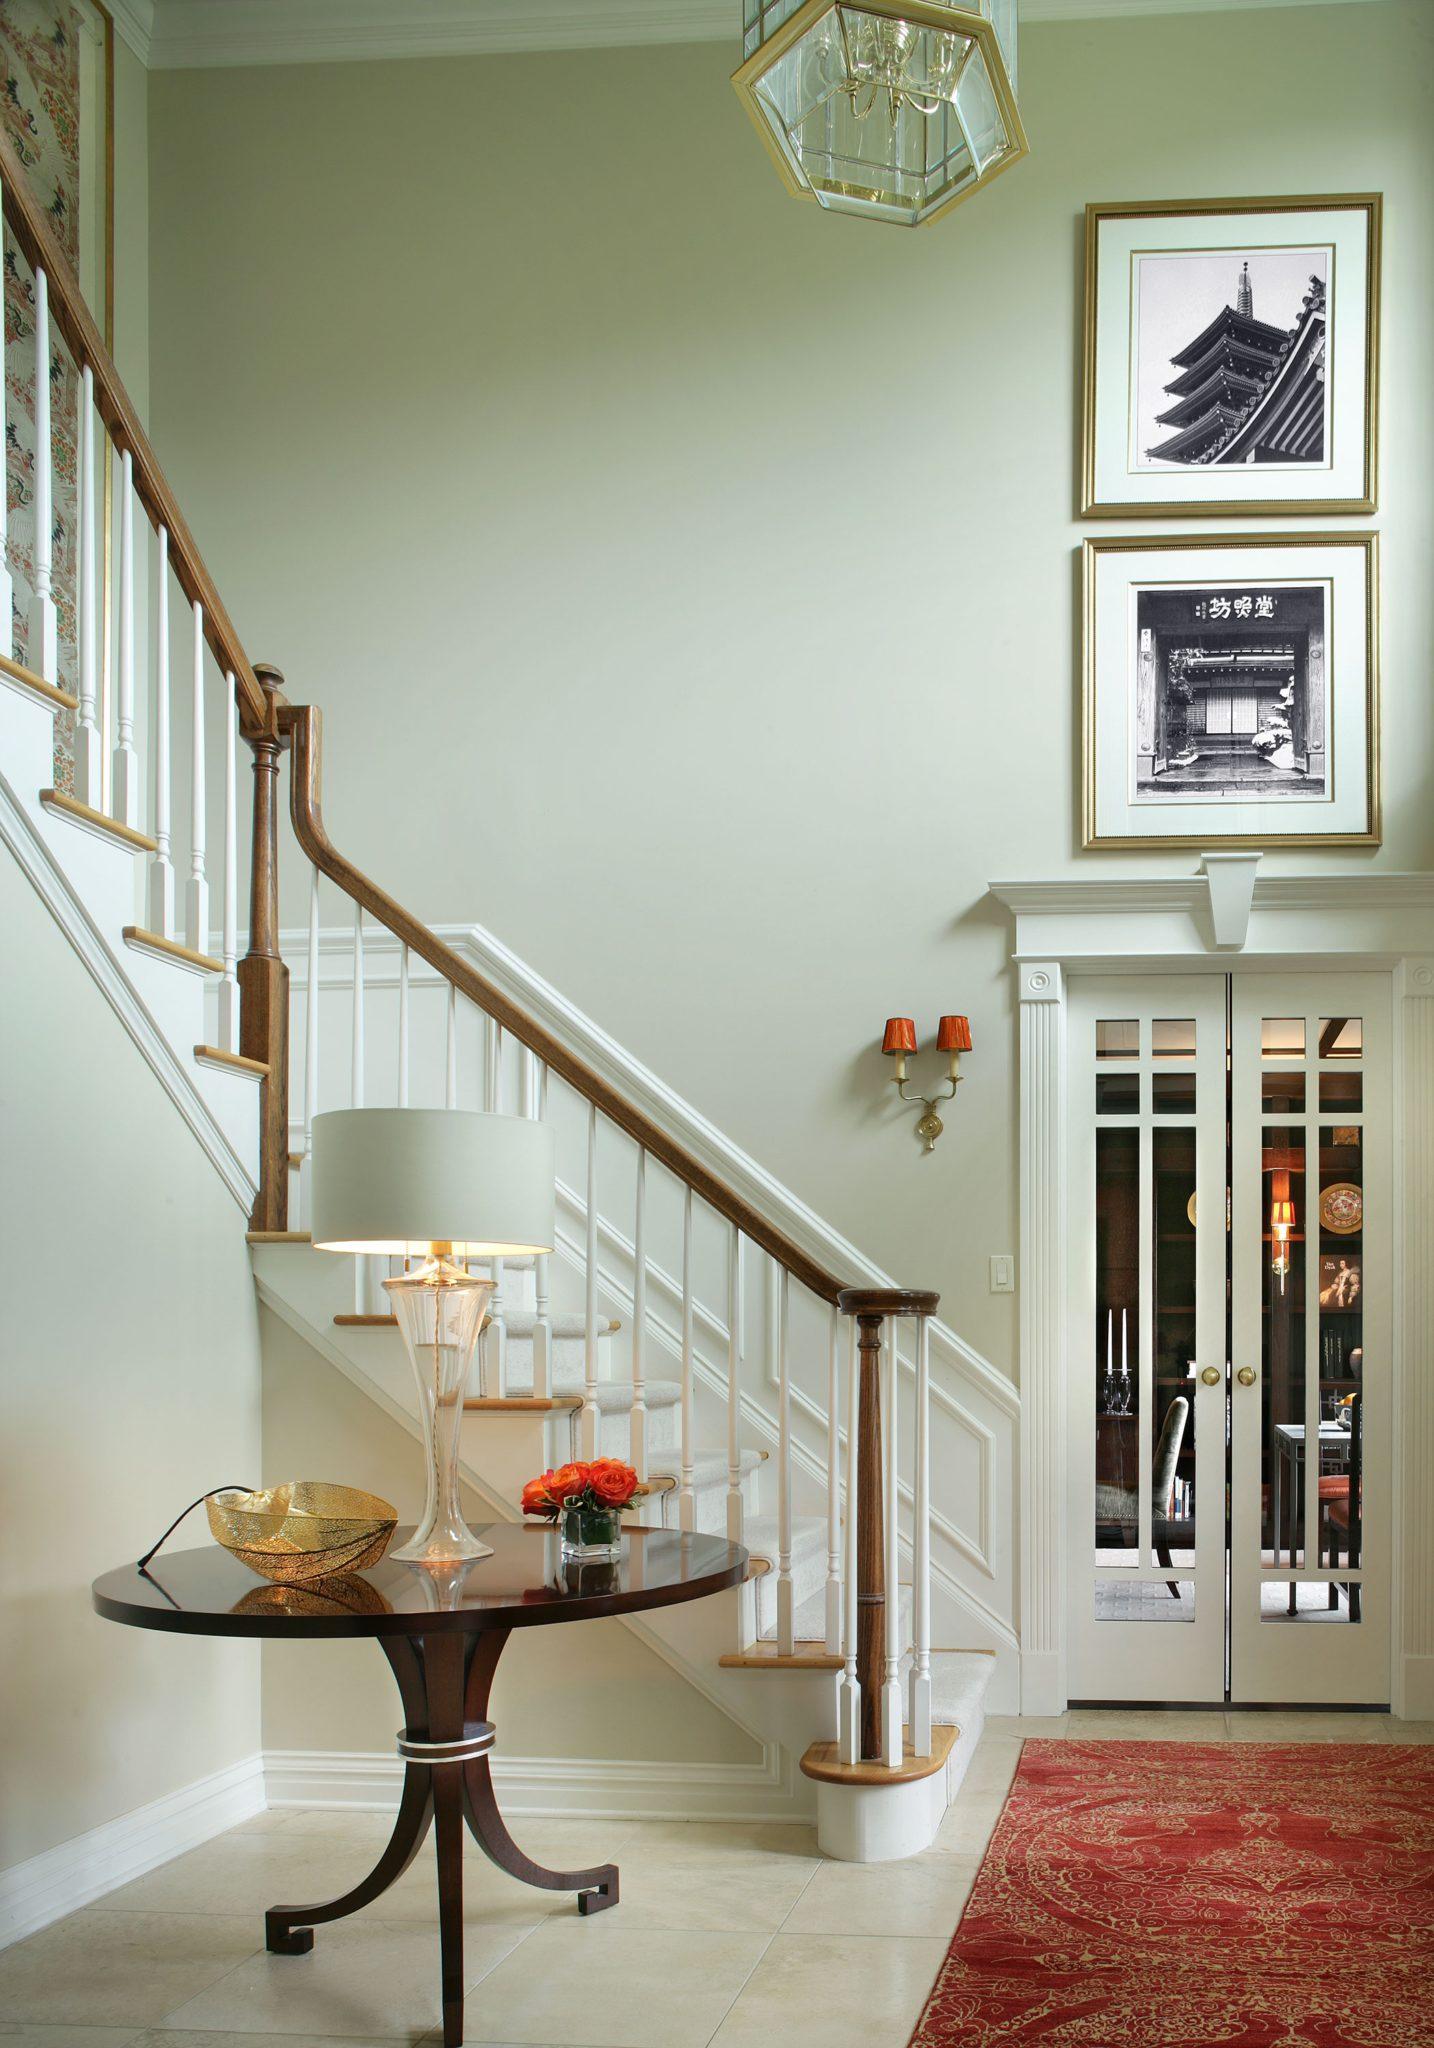 Interior design byJ. Stephens Interiors